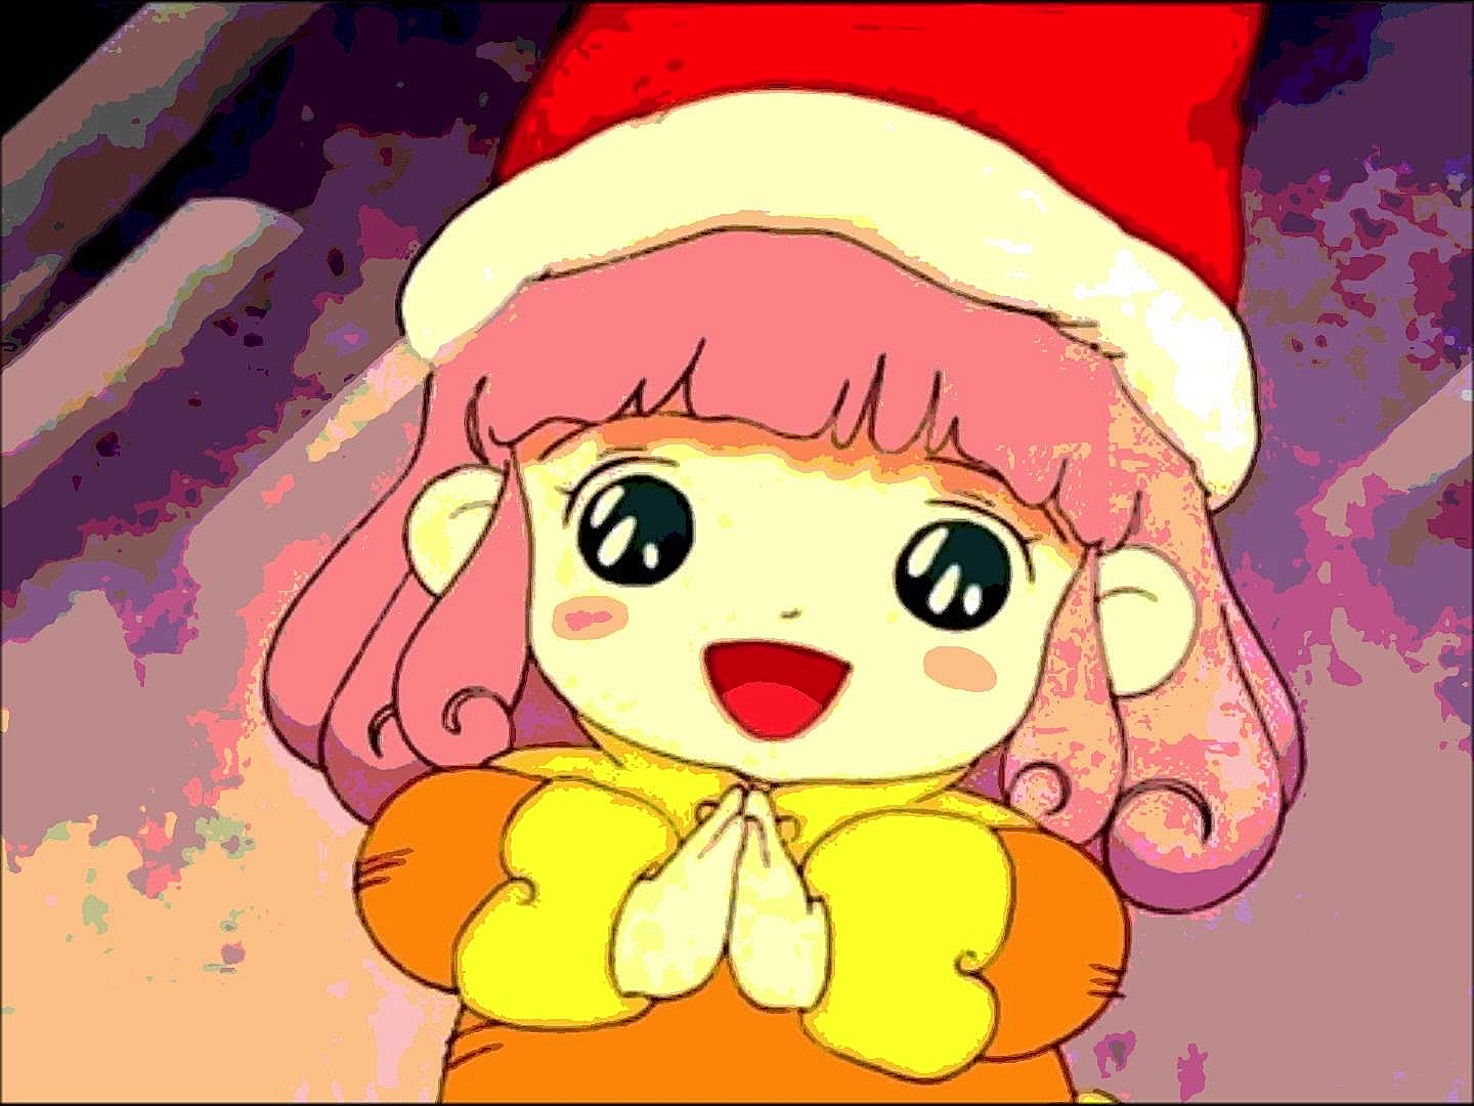 memole_dolce_memole_cristina_davena_sigla_anime